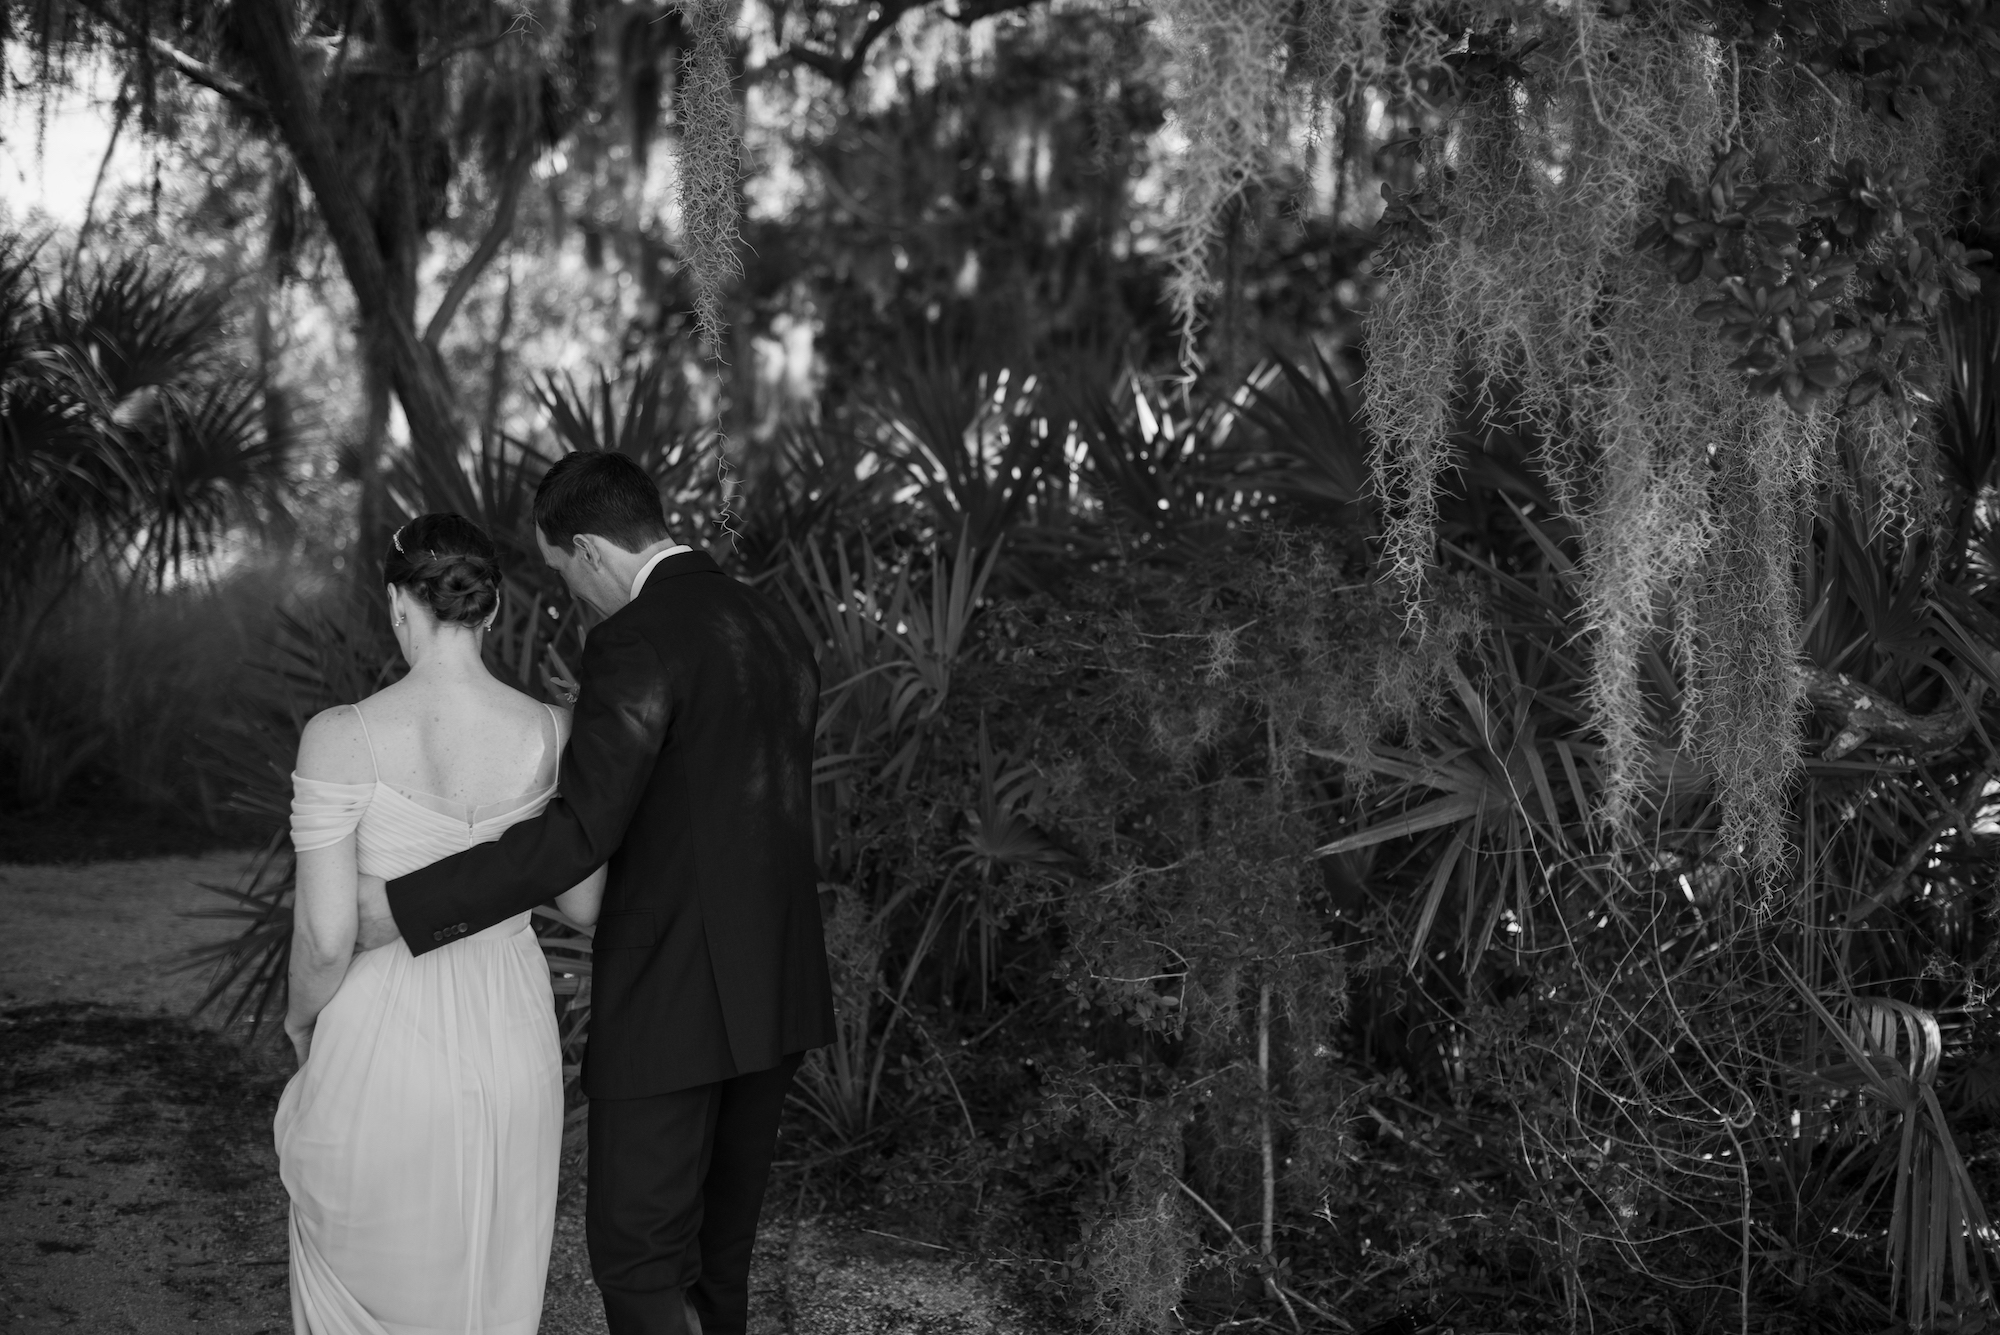 st-augustine-photographers-st-augustine-wedding-photographer-sarah-annay17.jpg